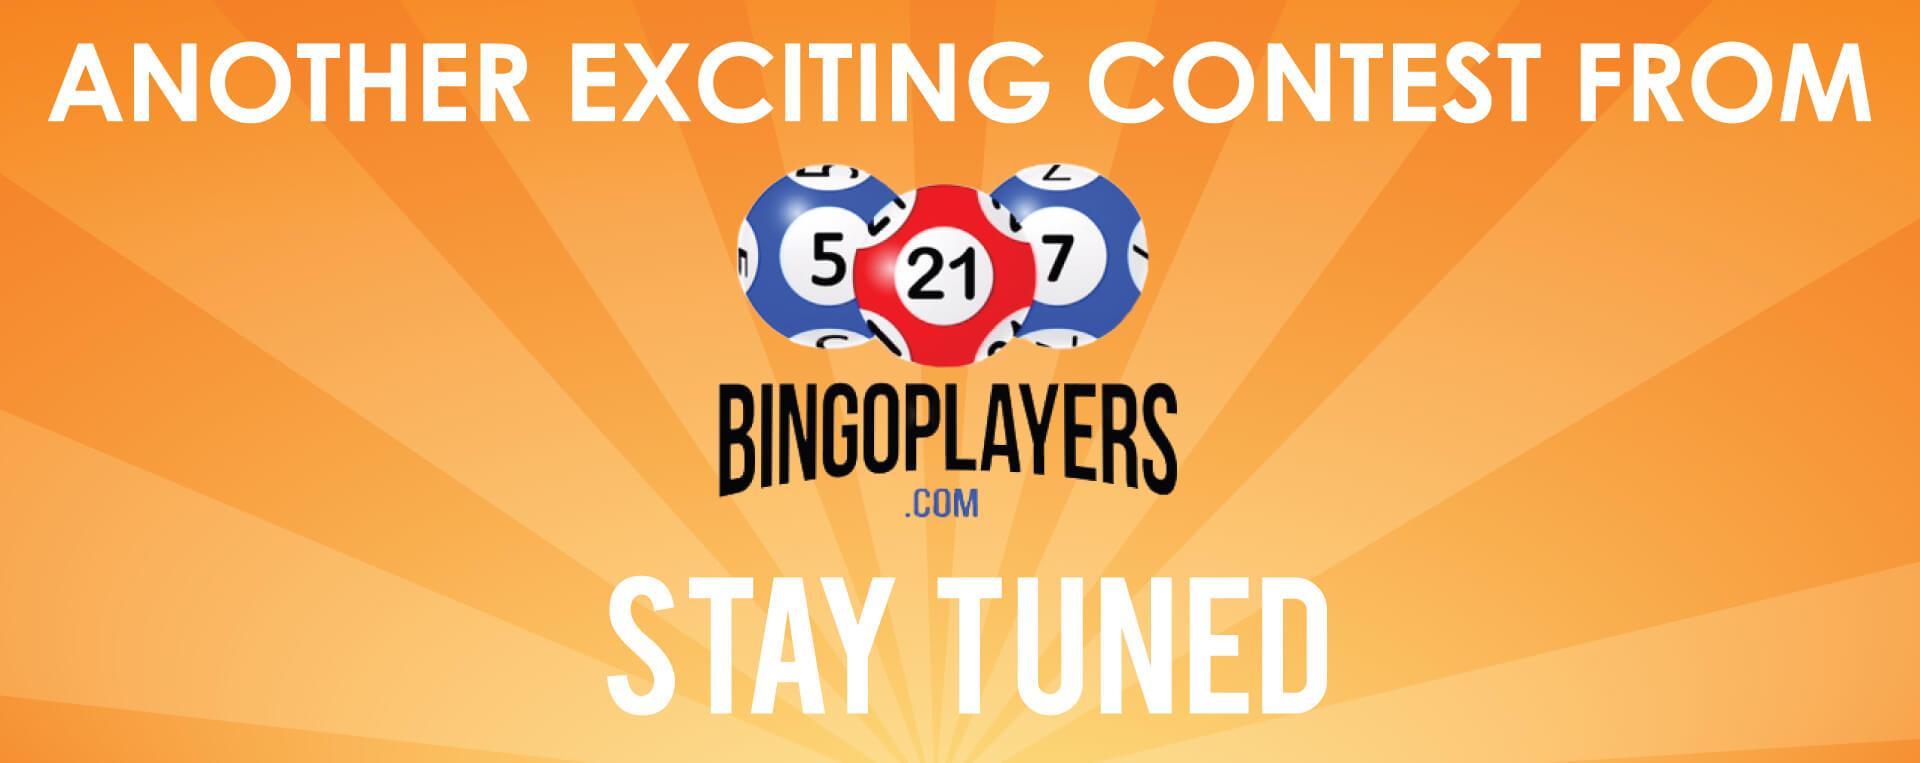 bingoplayers-contestslider-1